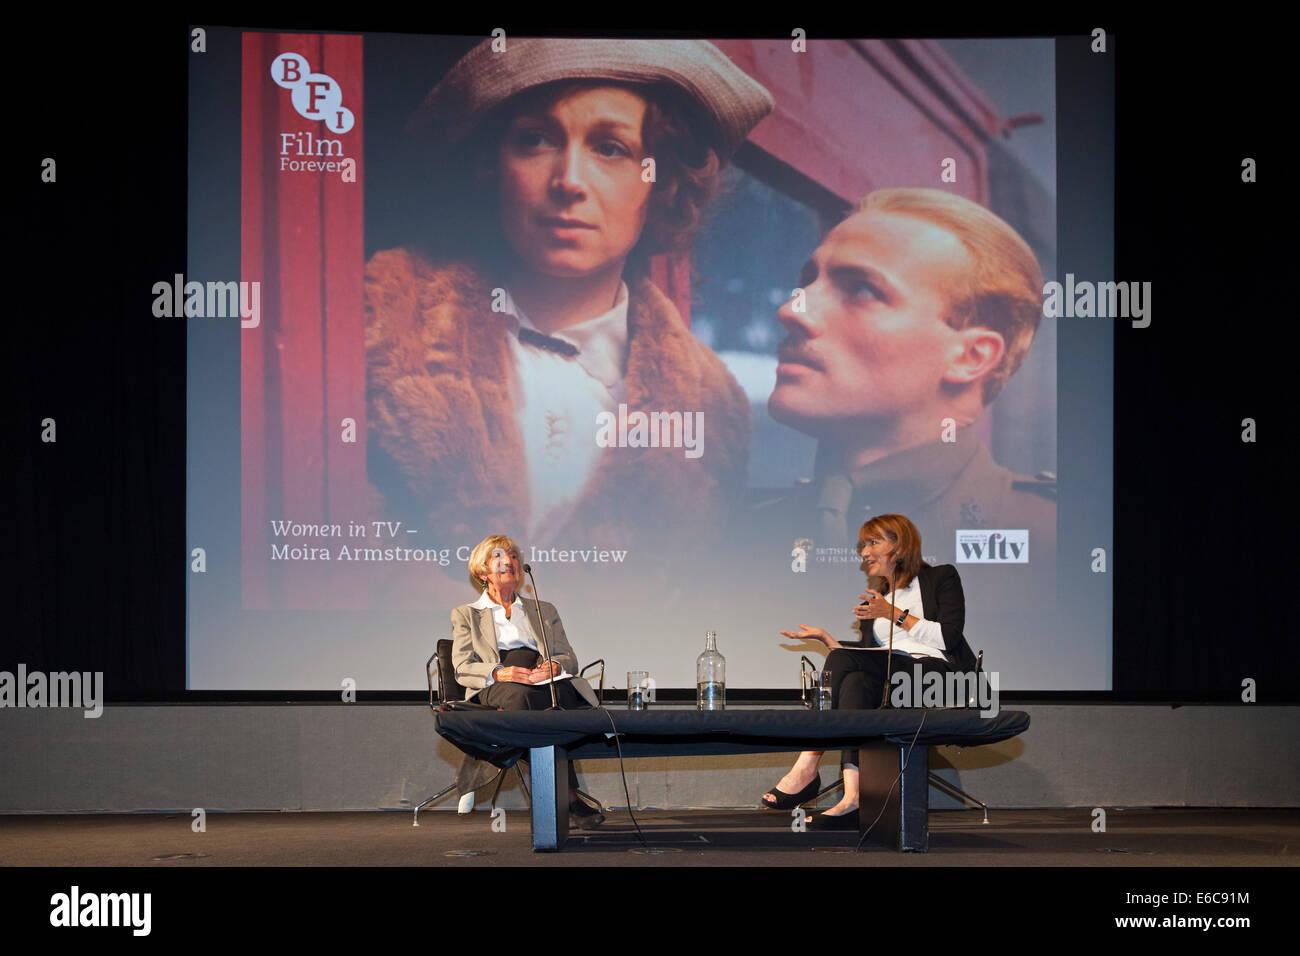 London, England, UK, 19. August 2014. BAFTA-Award preisgekrönten Multi-Kamera-TV Drama Regielegende Moira Armstrong Stockbild